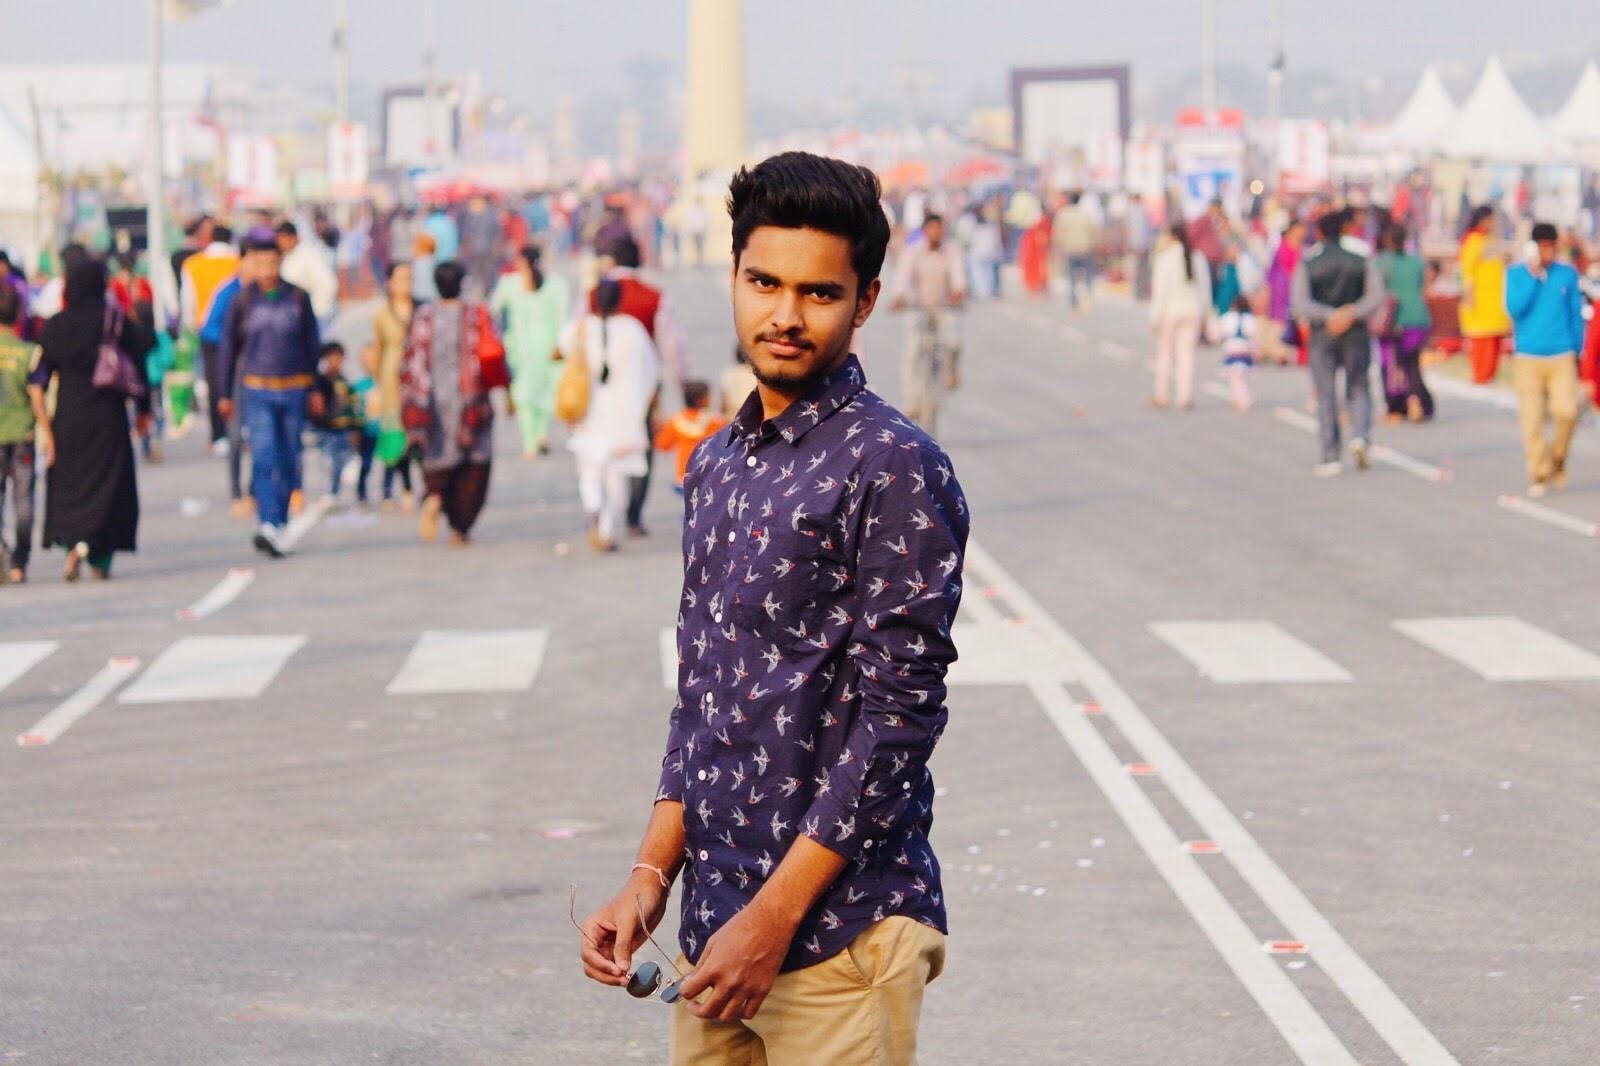 Go to Ishant Mishra's profile